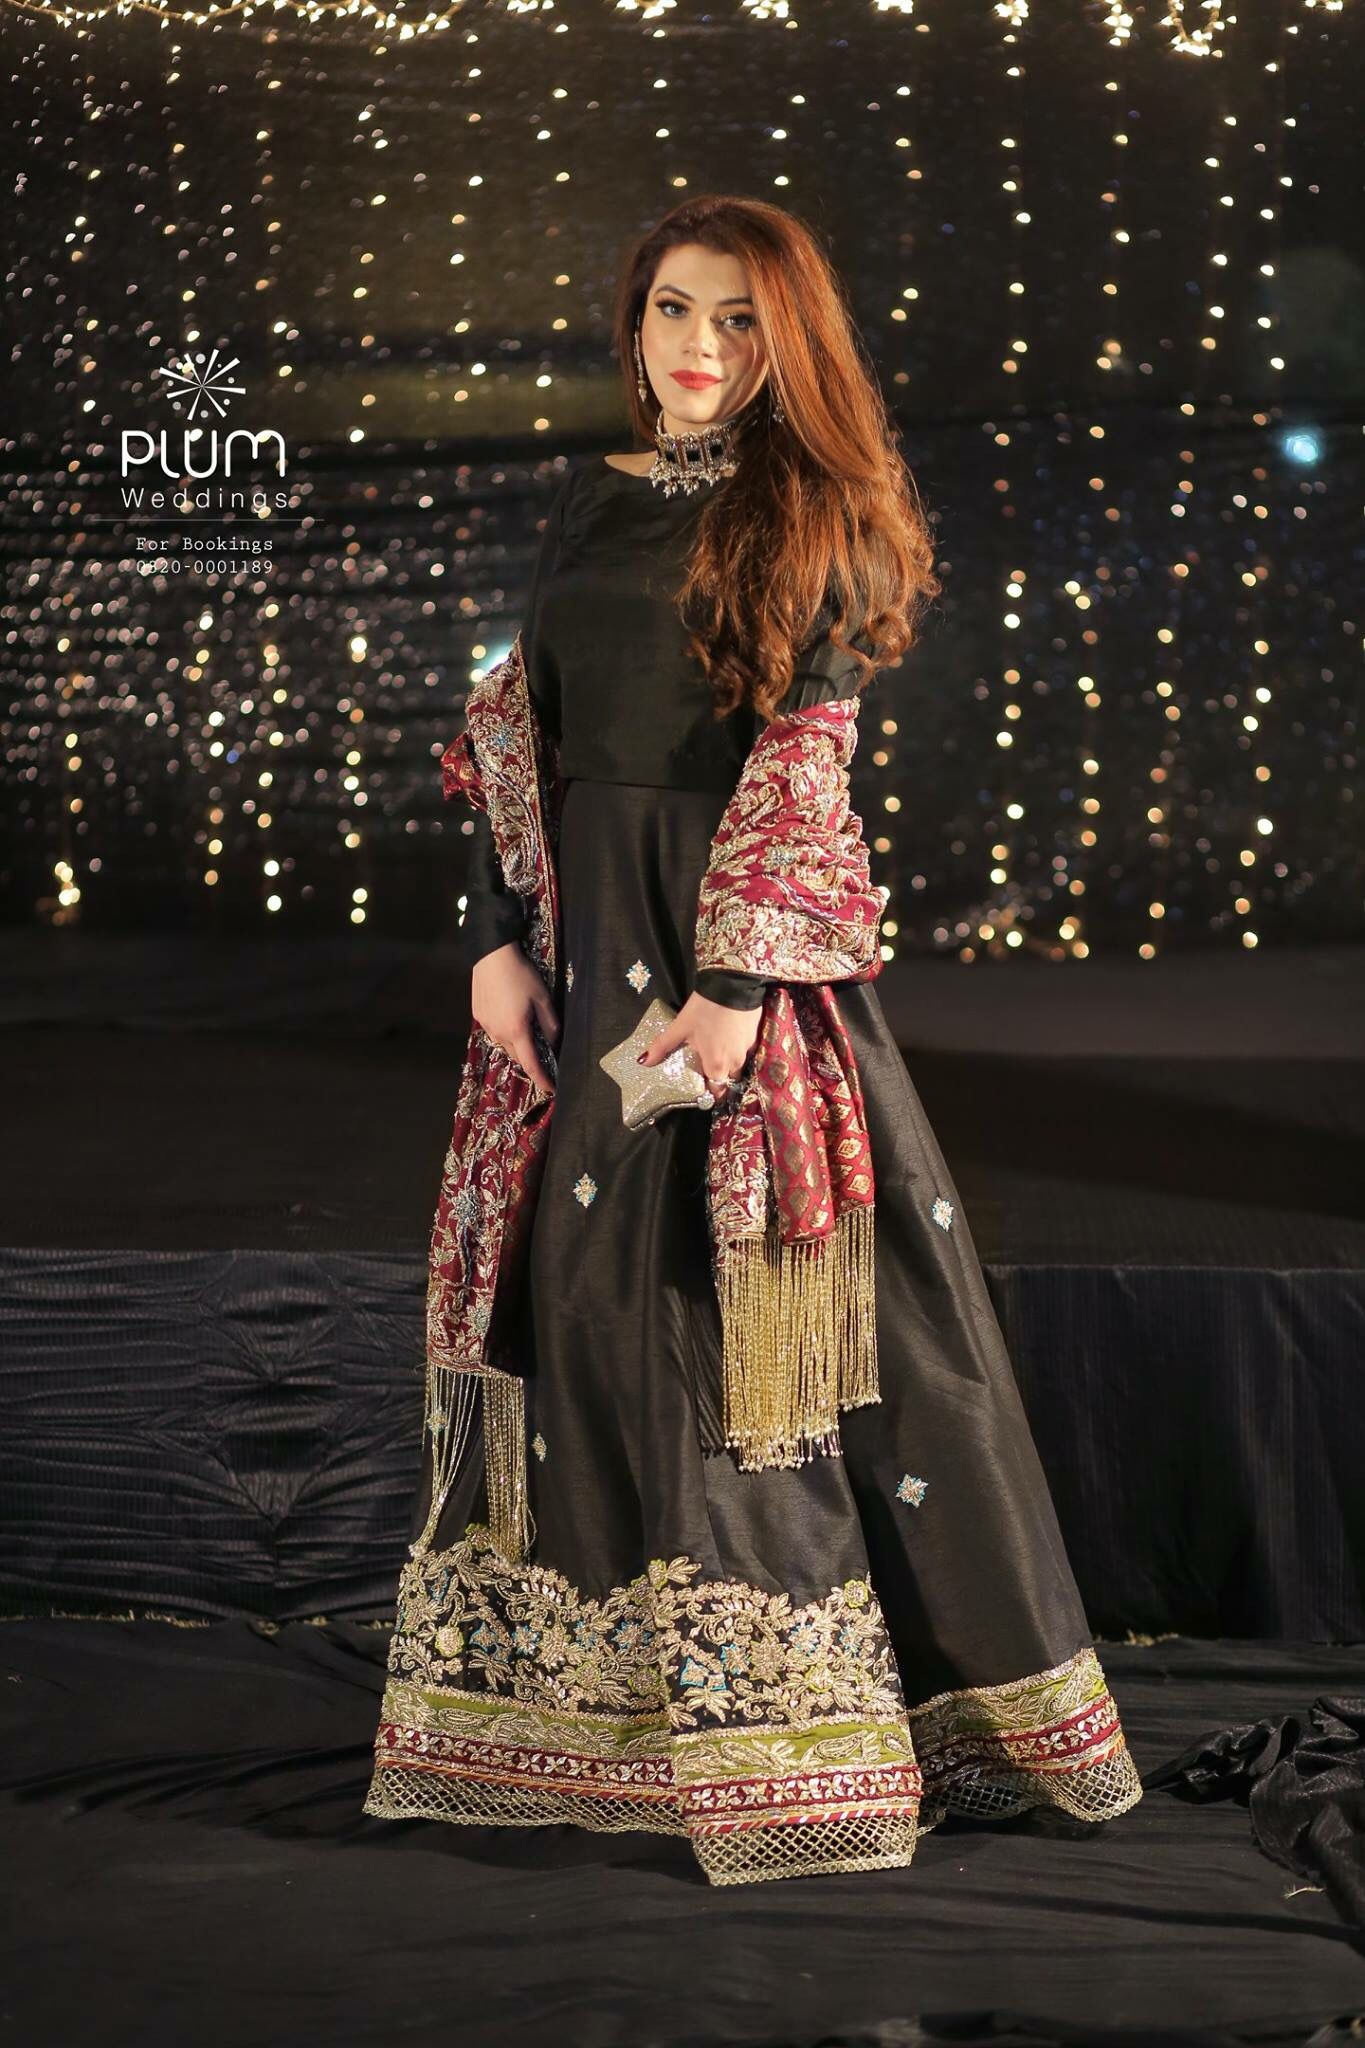 Black Wedding Party Dress Mizznoorboutique Pakistani Bridal Dresses Pakistani Wedding Outfits Bridal Dress Design